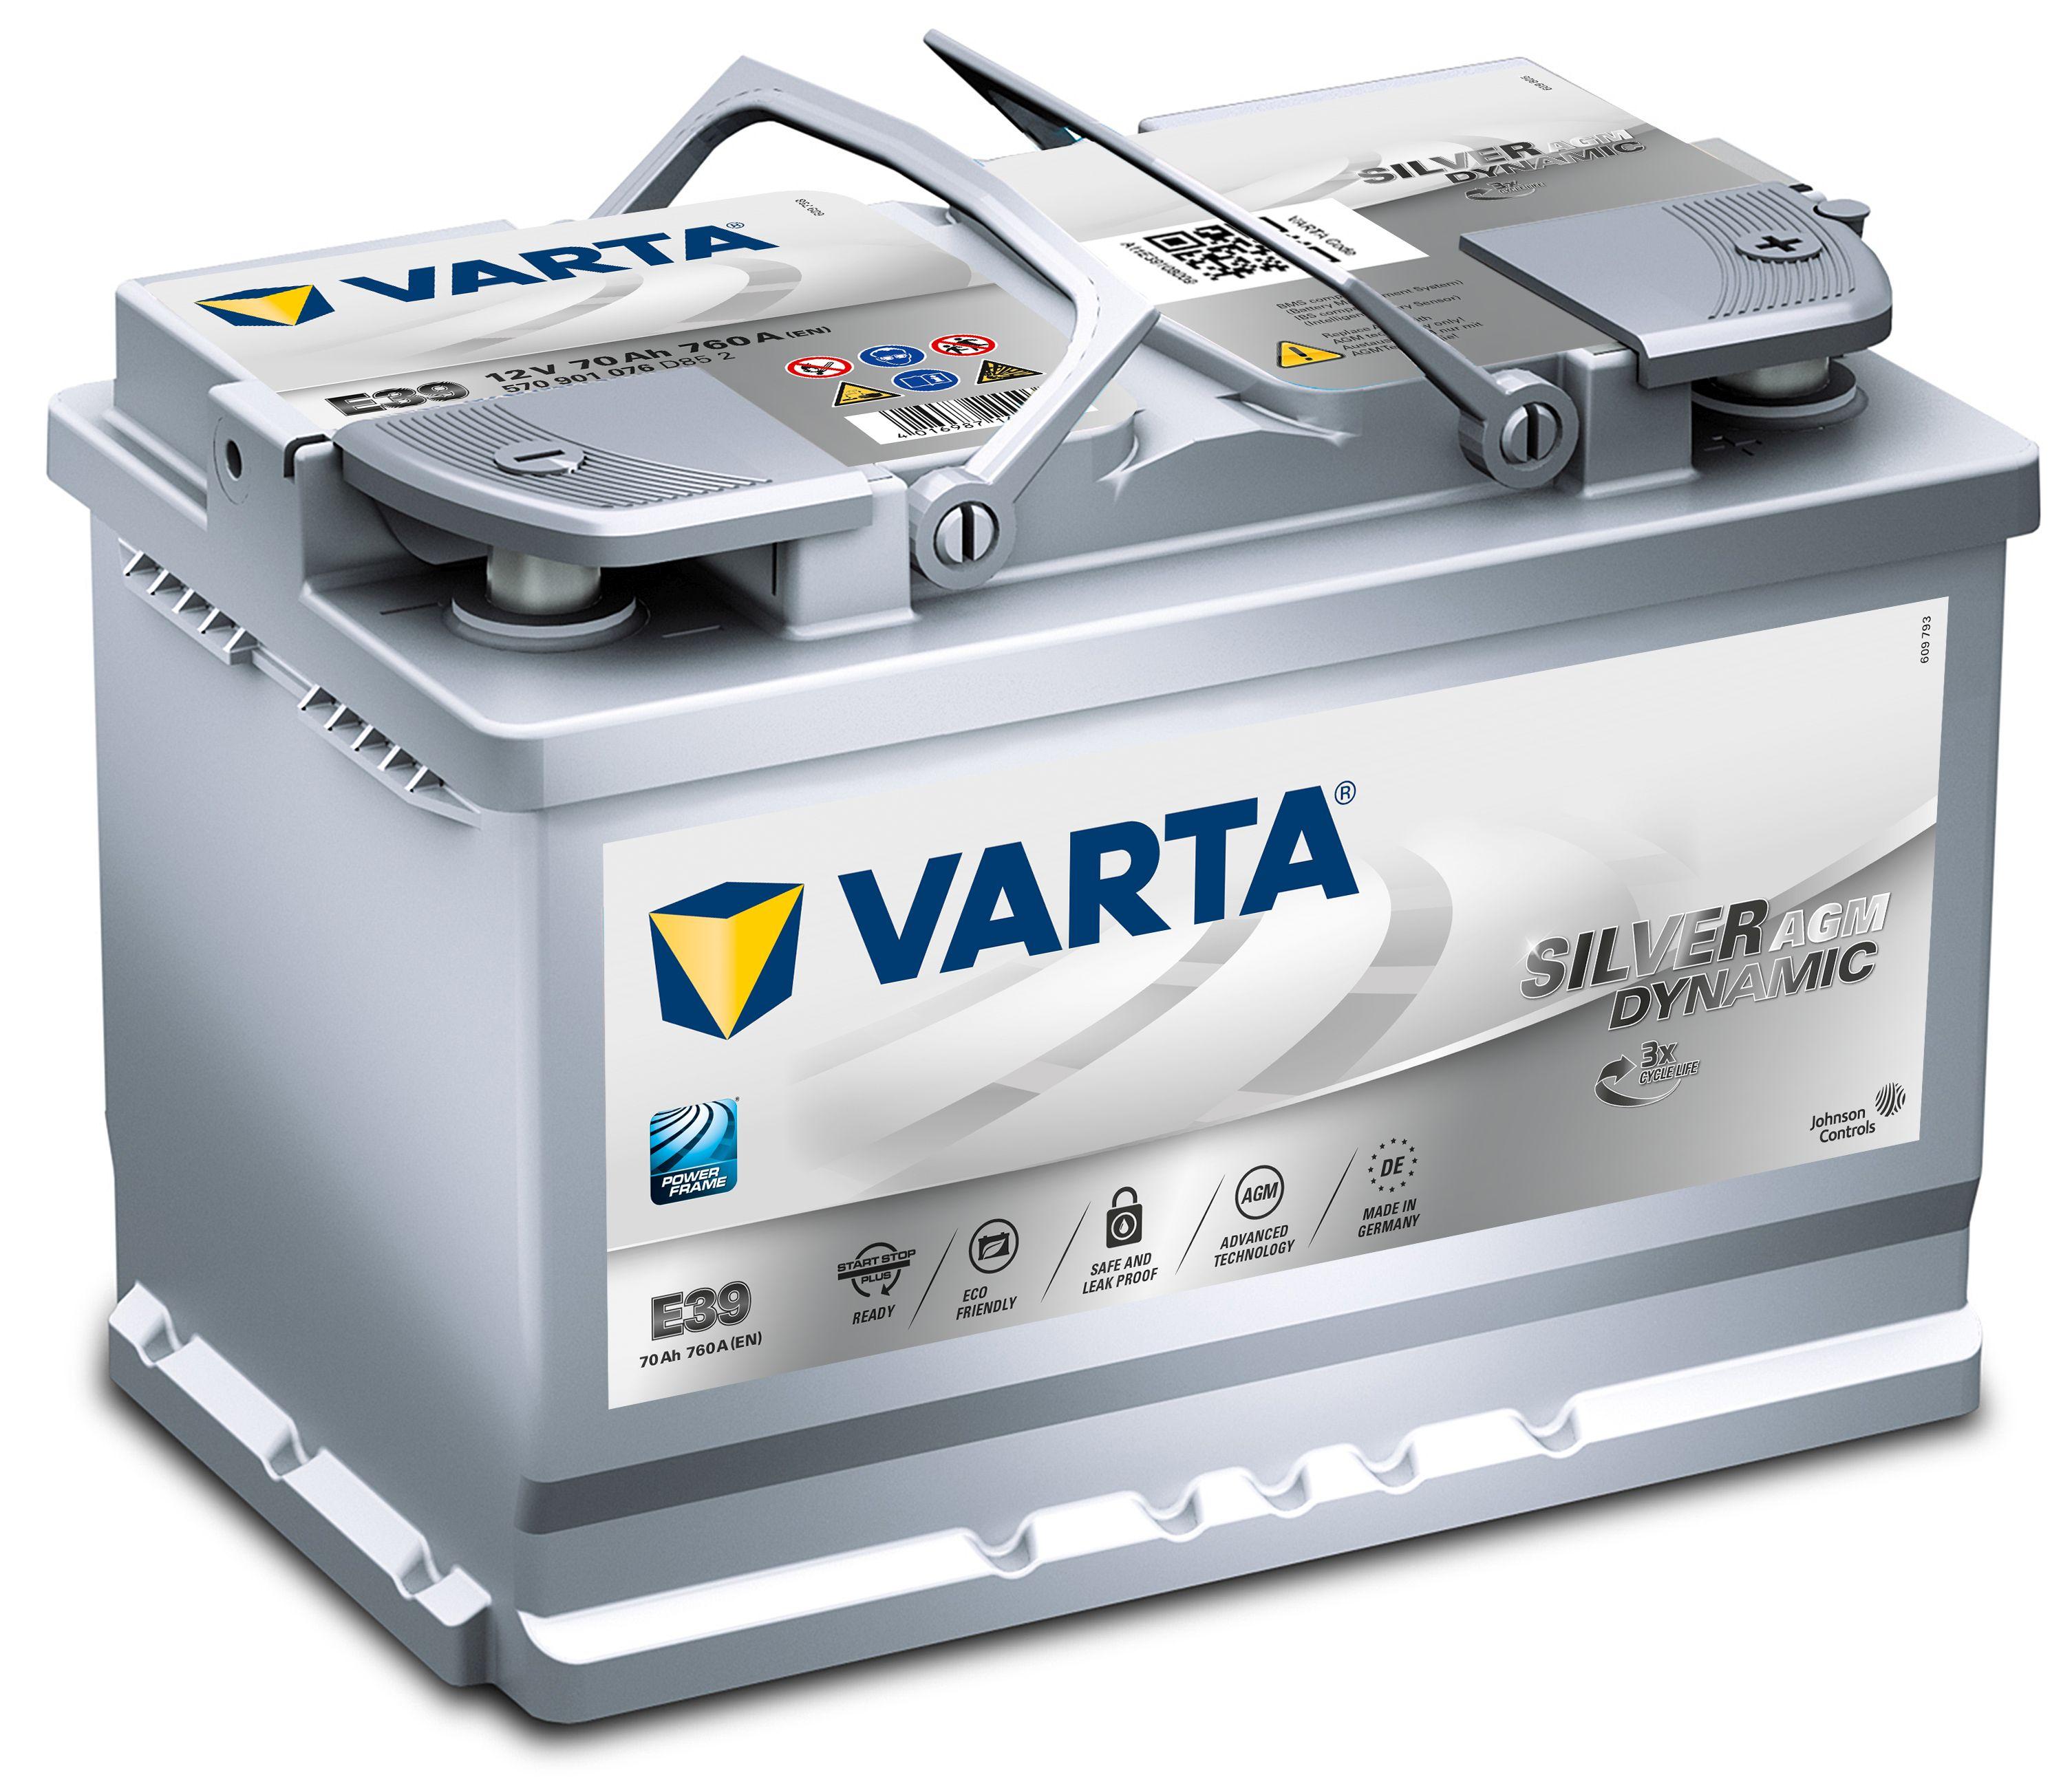 Varta-Silver-Dynamic-AGM-12V--70-Ah-jobb--start--stop-rendszeru--auto-akkumulator--